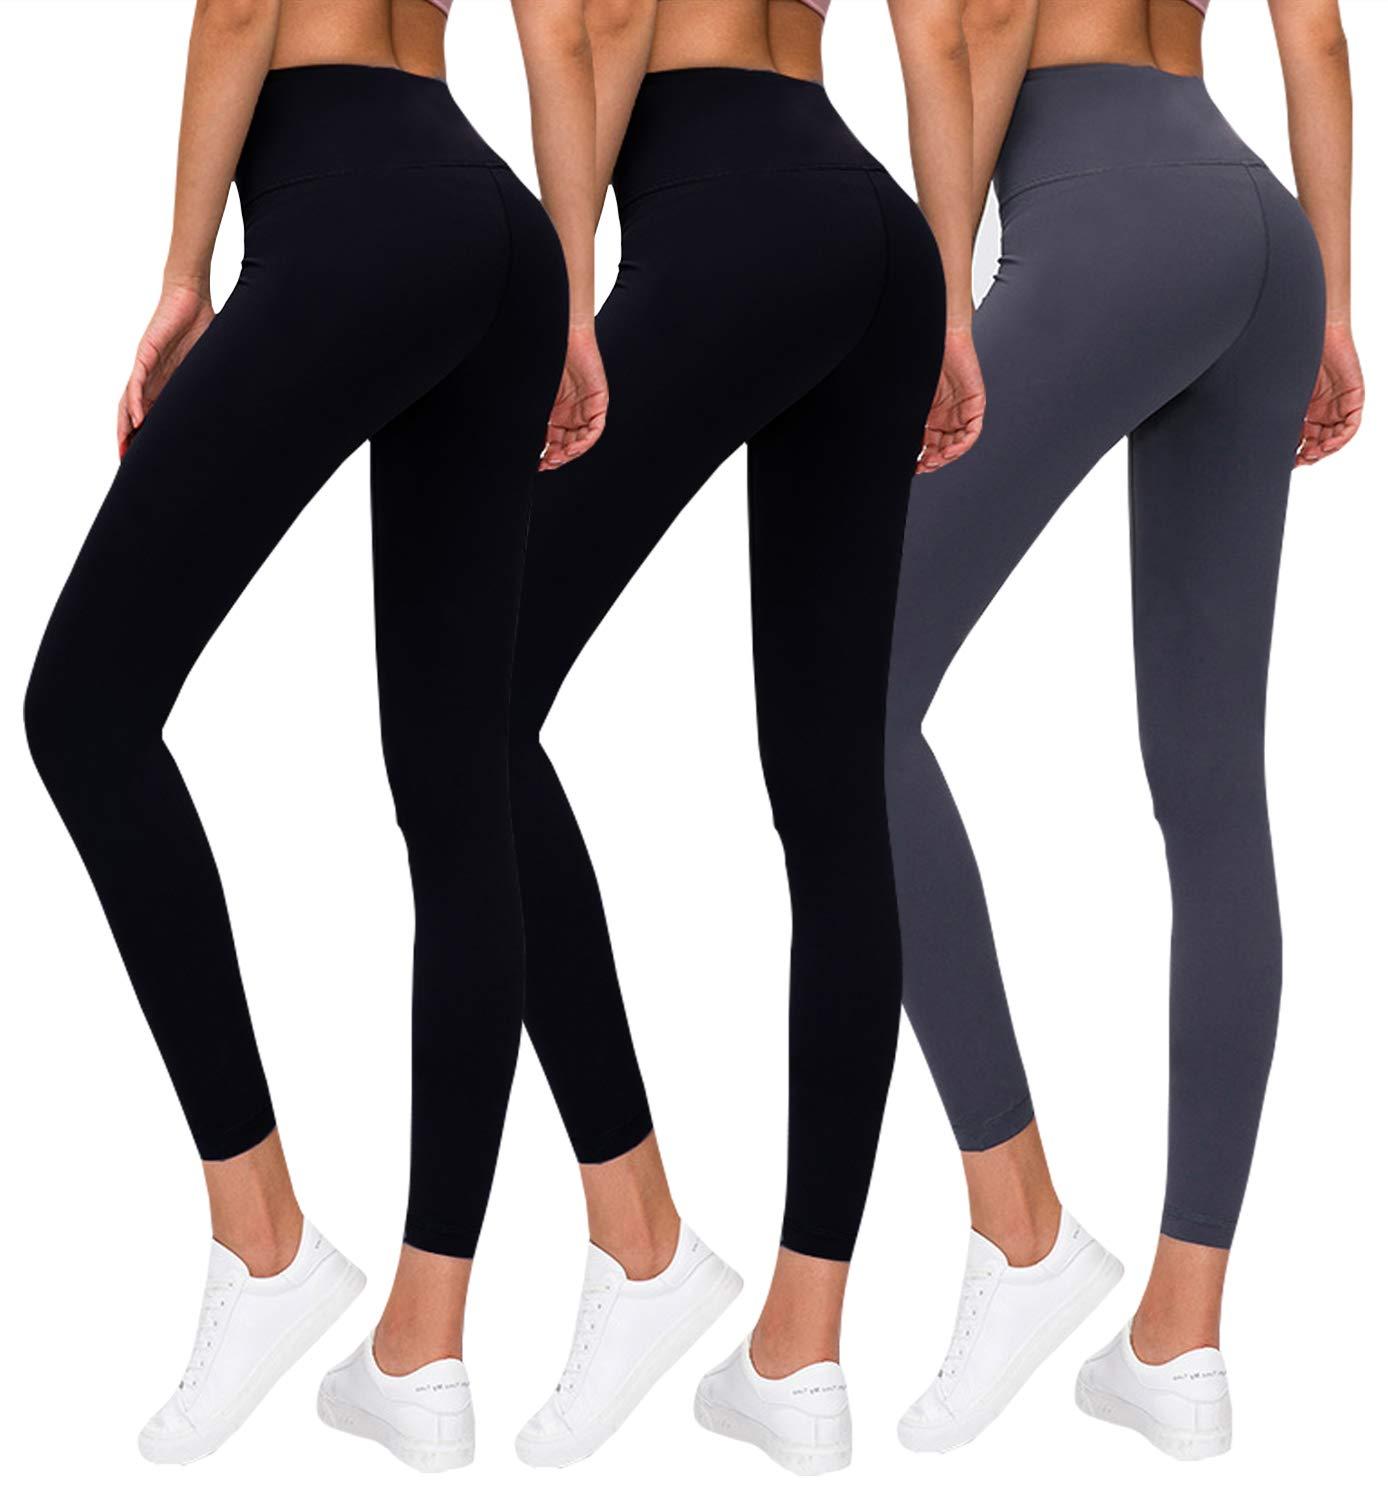 Premium Womens Leggings Soft High Waist Slimming Leggings Tummy Control Workout Yoga Pants